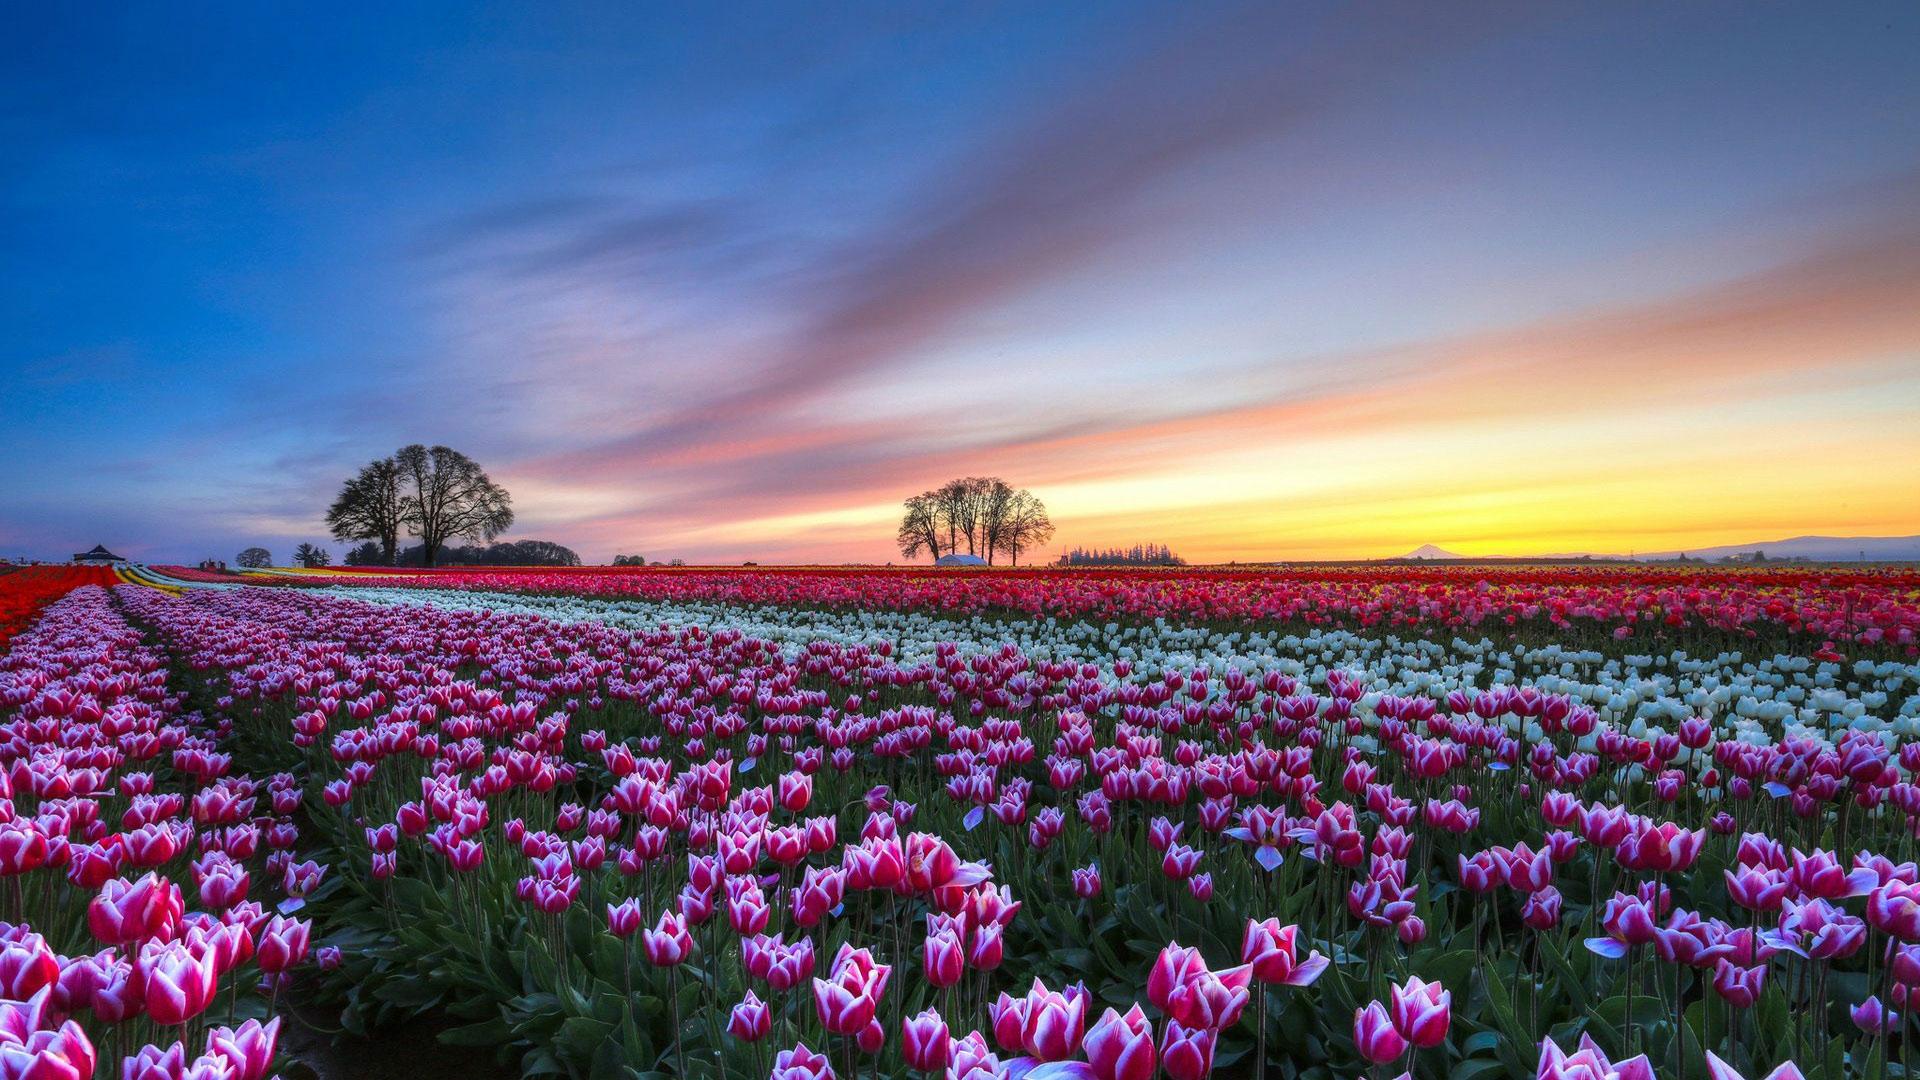 Plano De Fundo Full Hd: Papel De Parede Flores Da Primavera